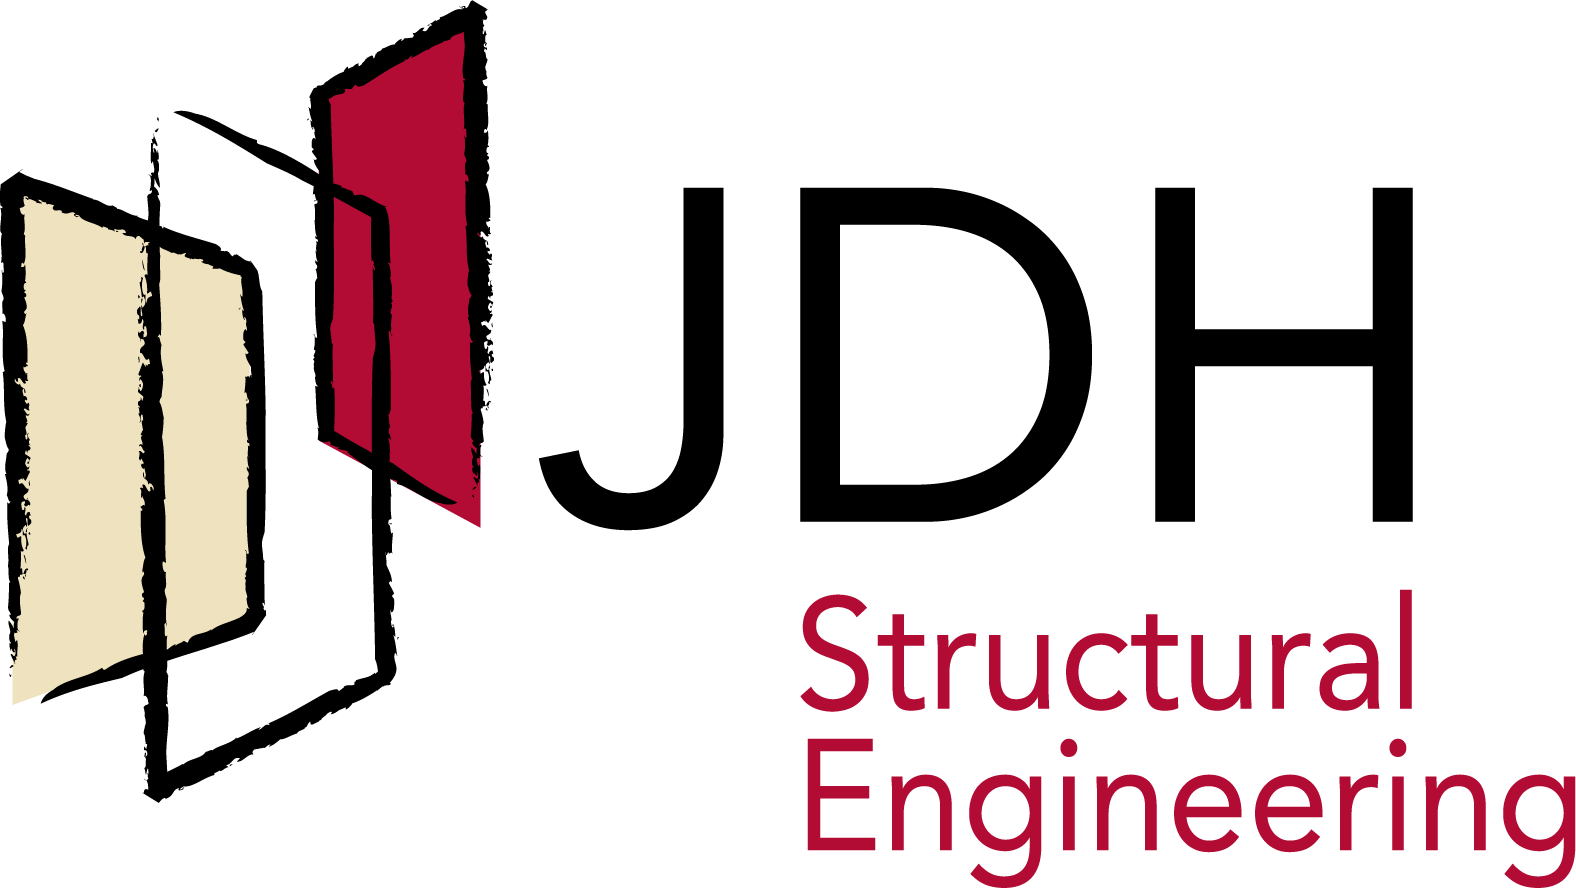 JDH Engineering